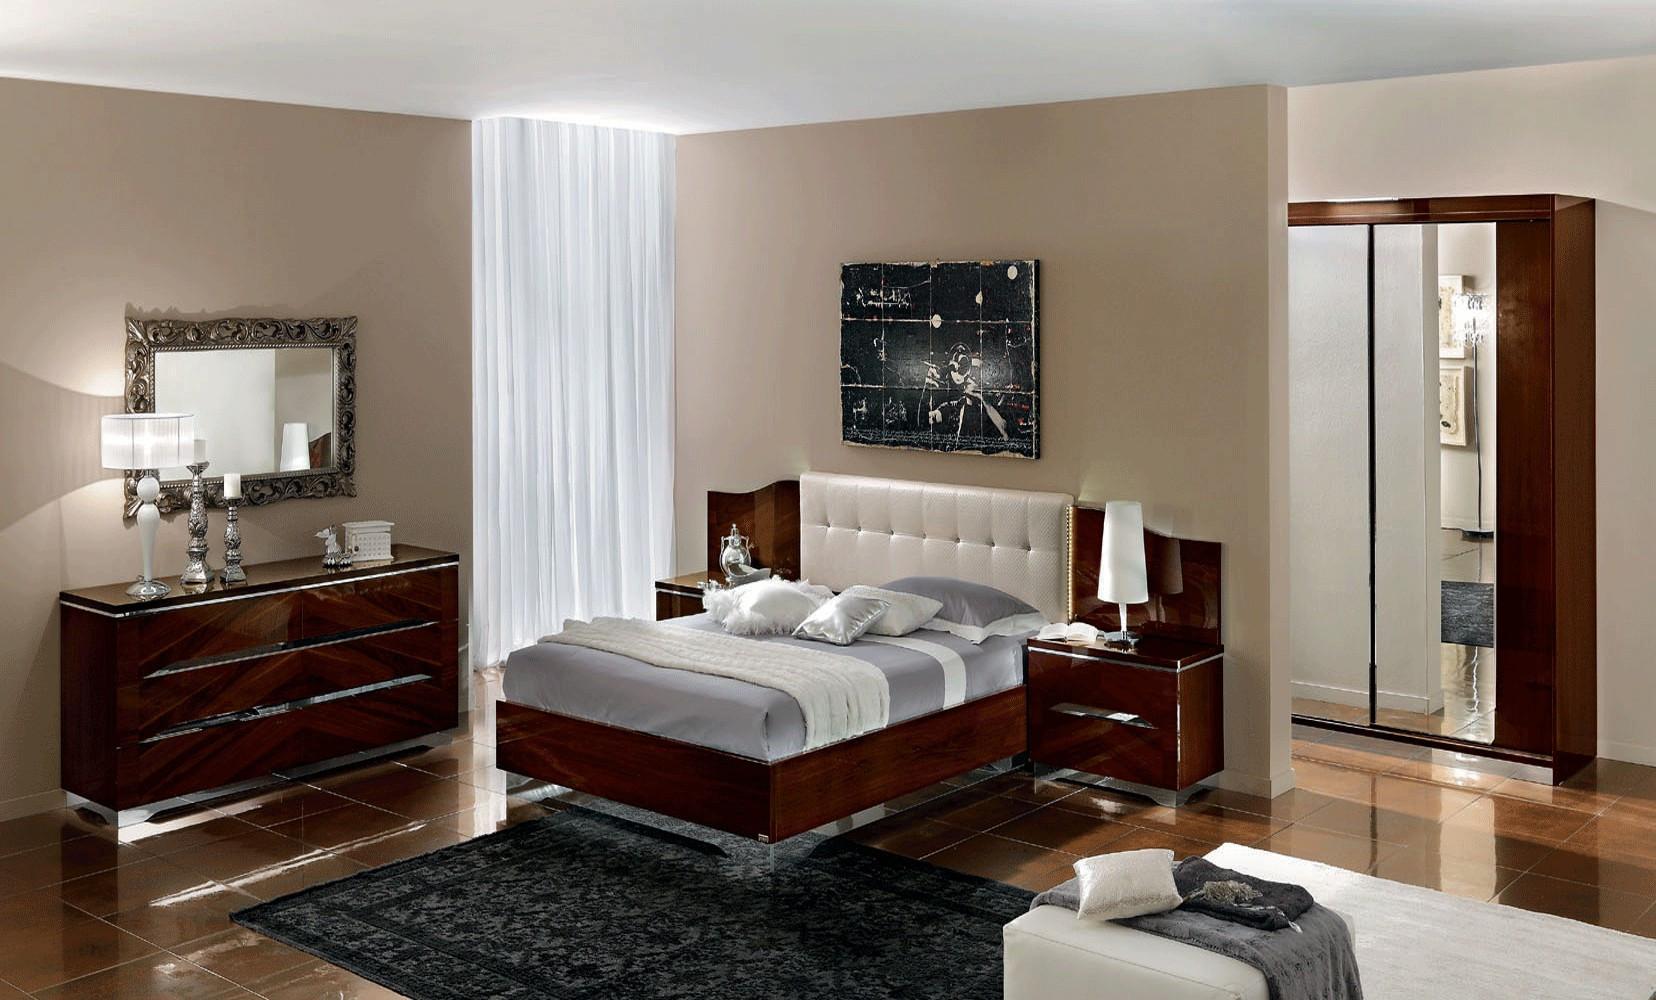 Matrix Italian Bedroom Set In Cherry Lacquer Finish